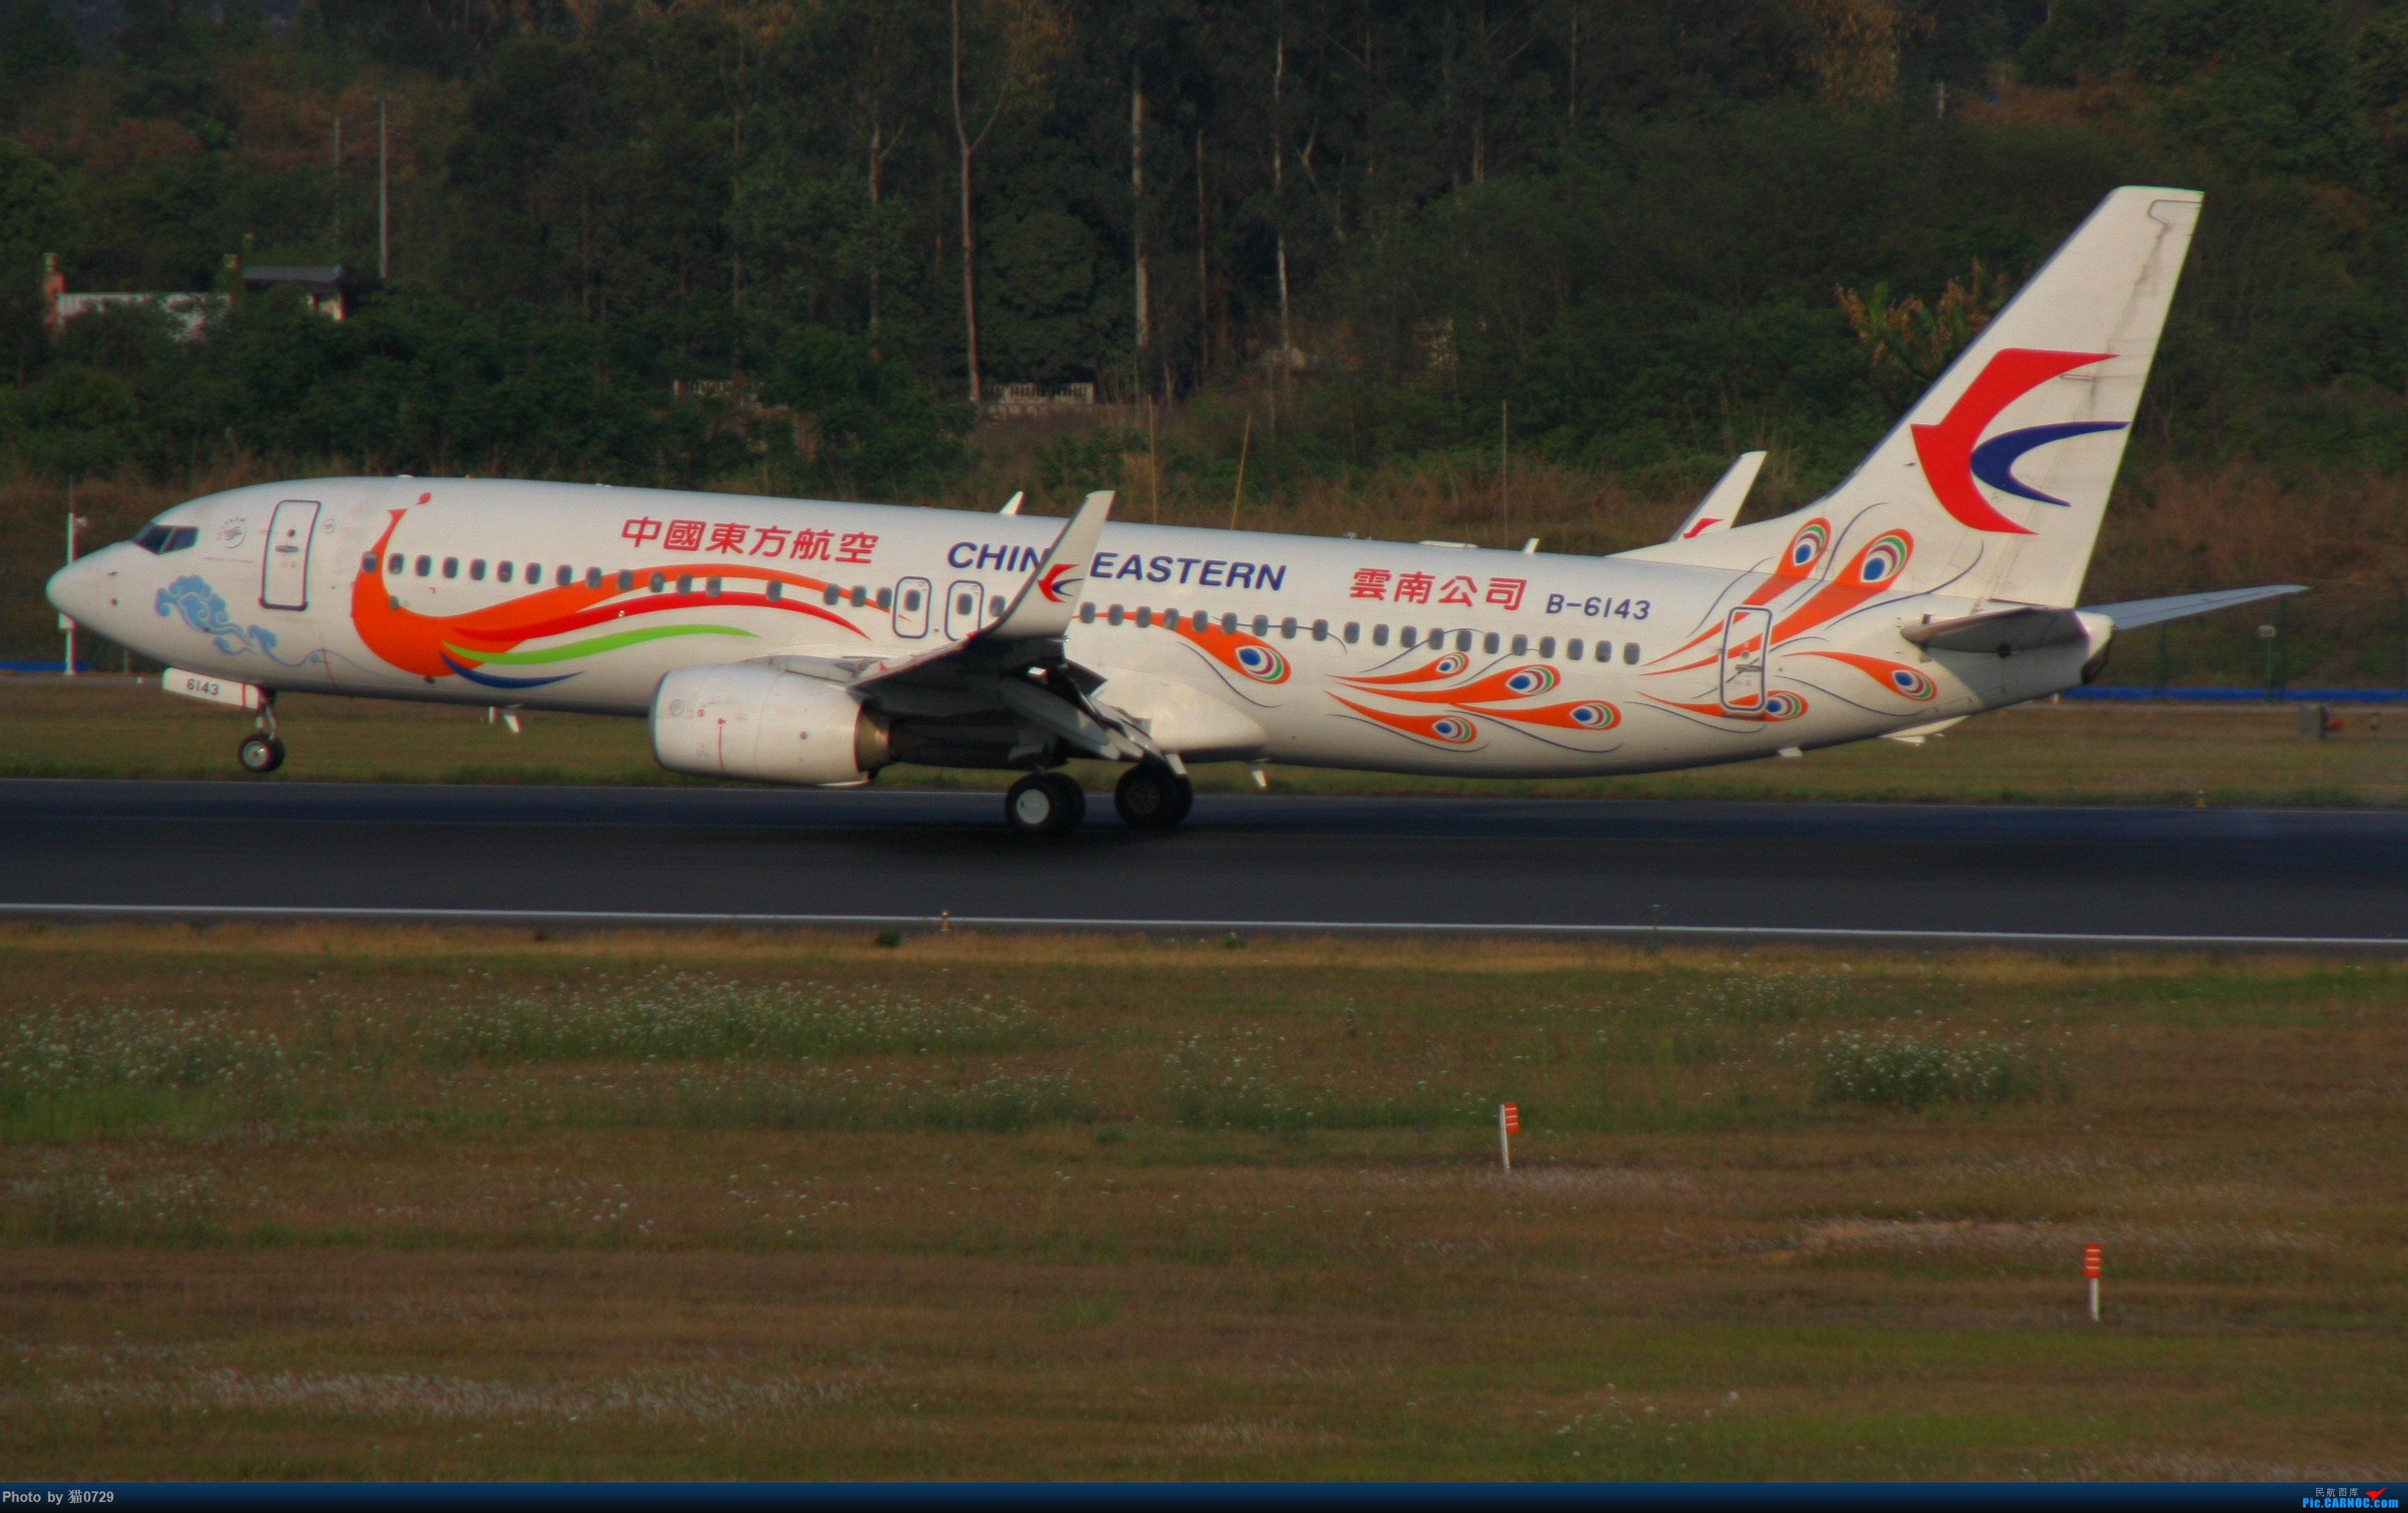 Re:[原创]CTU 119.425 水泥 伊朗346 巴基斯坦777 BOEING 737-800 B-6143 中国成都双流国际机场